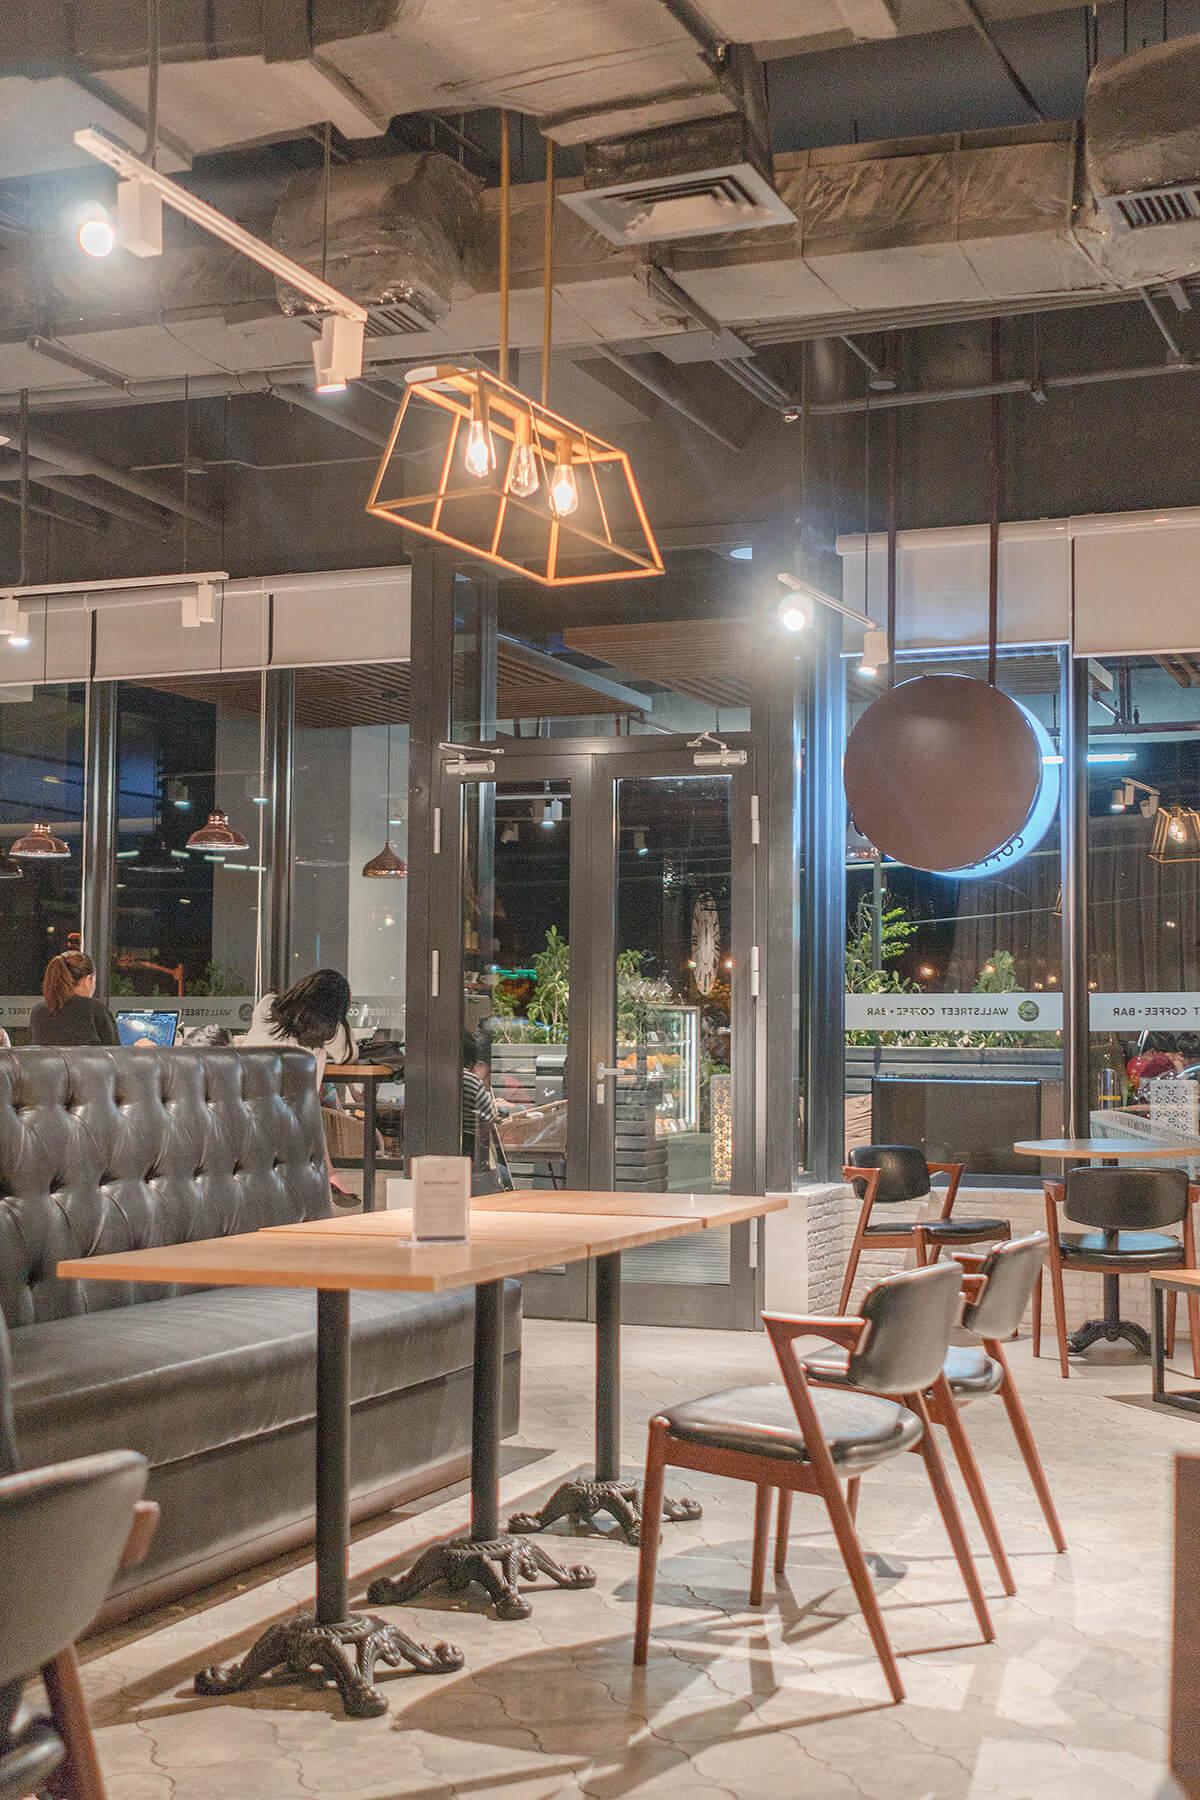 Bai Hotel Cebu Wallstreet Coffee and Bar